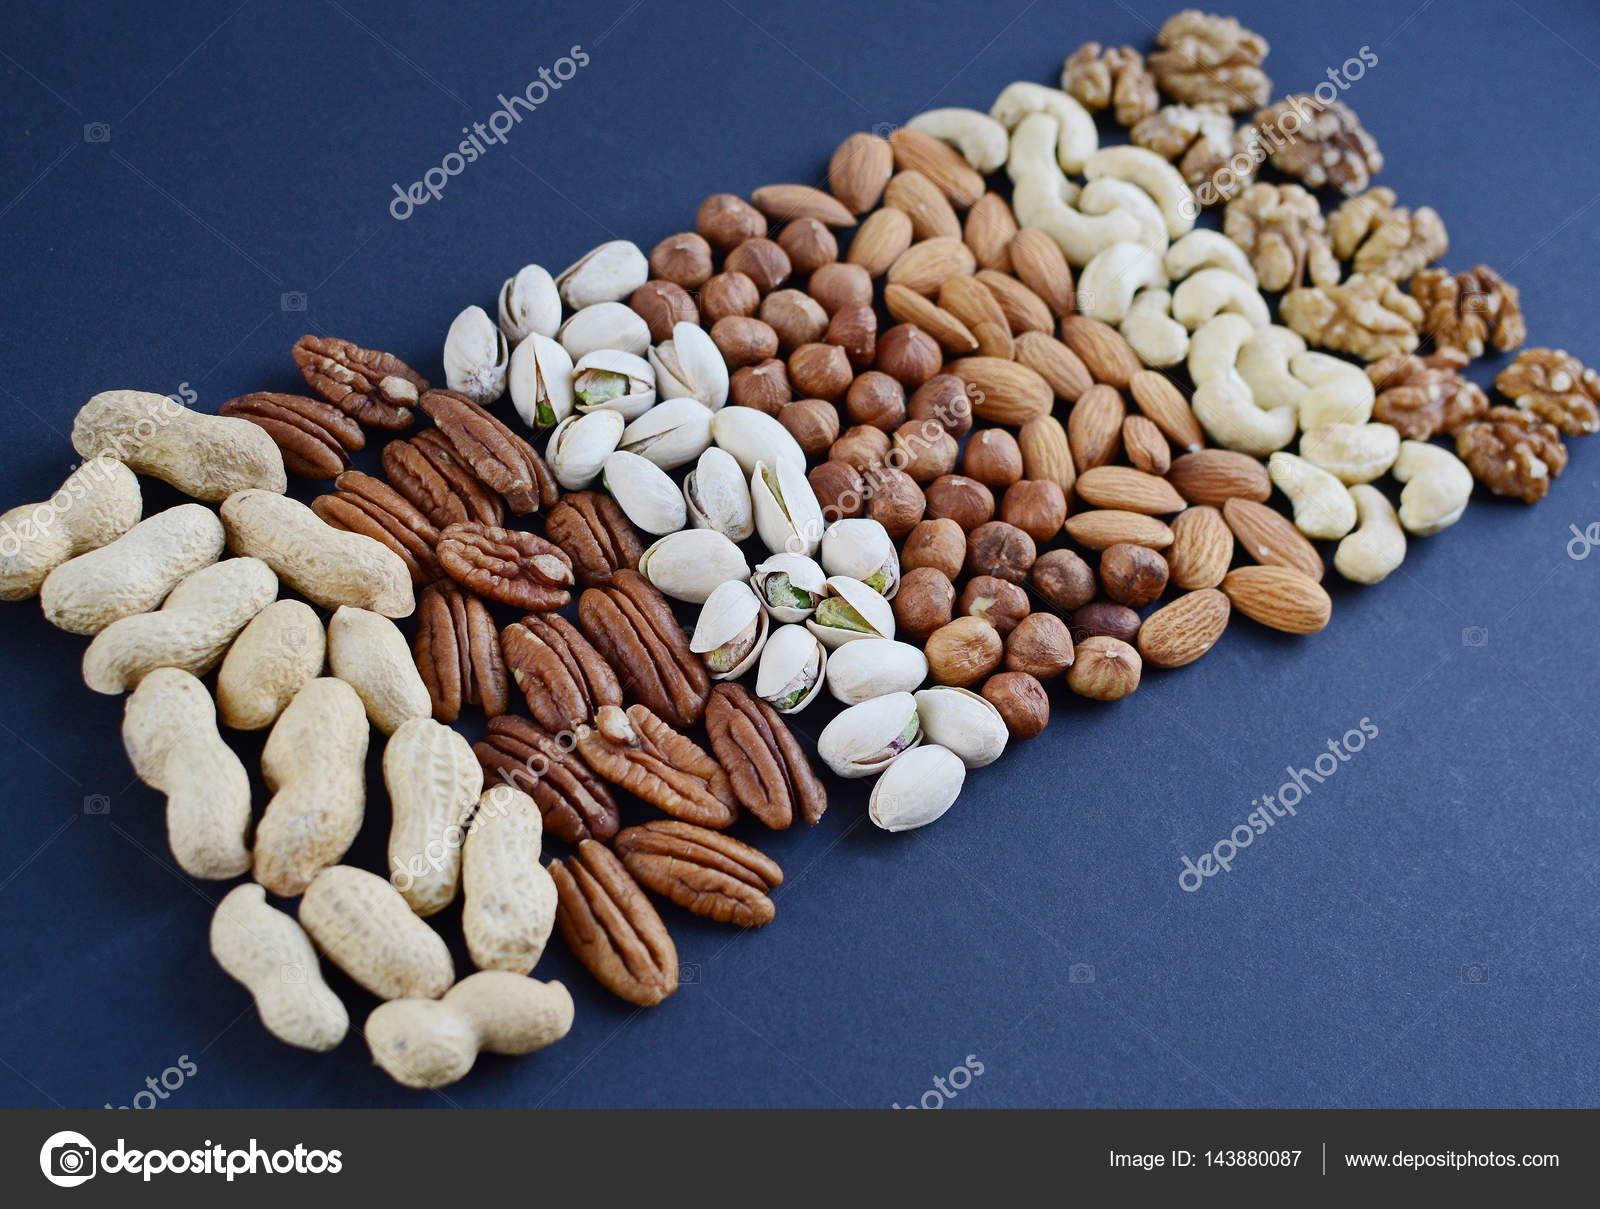 Assorted mixed nuts, peanuts, almonds, walnuts, pistachios